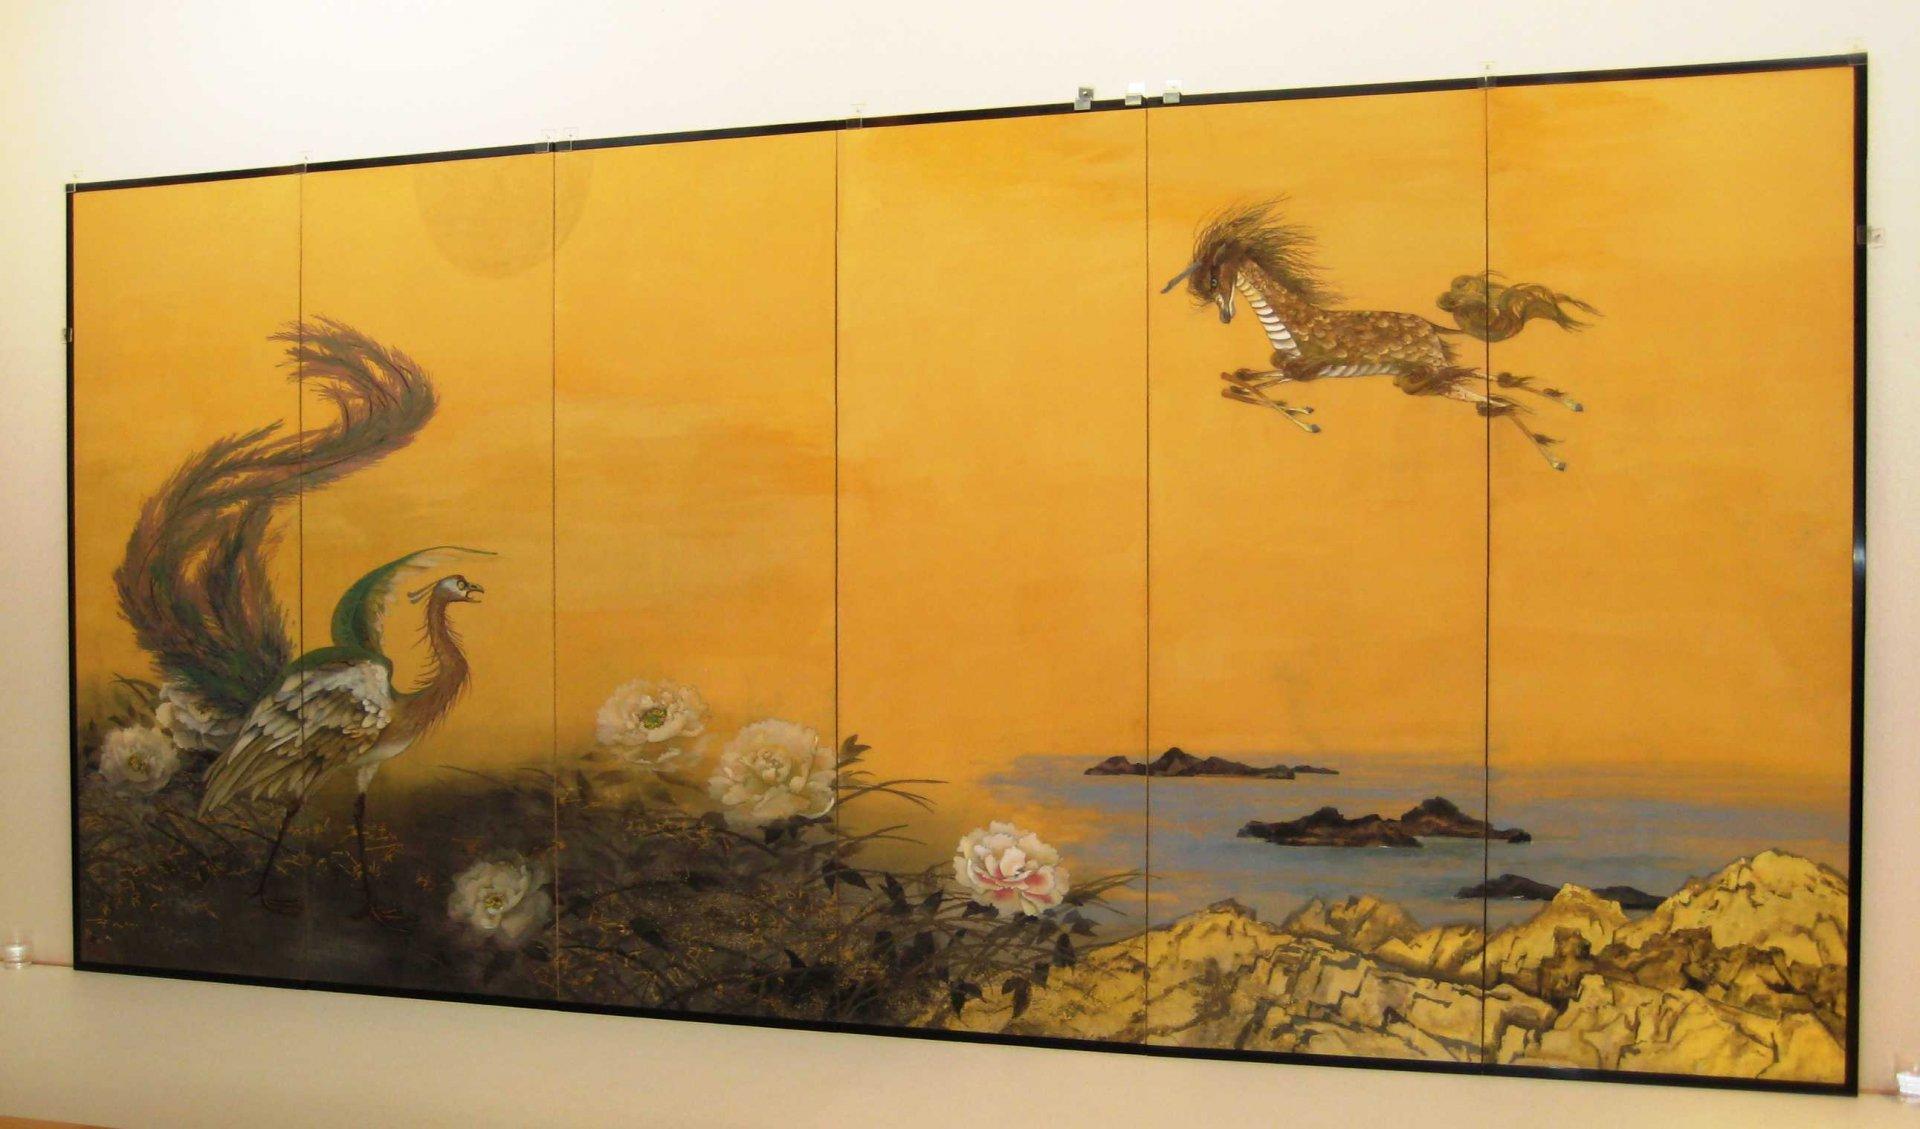 Hieda Kazuho20121129103726_0.jpg